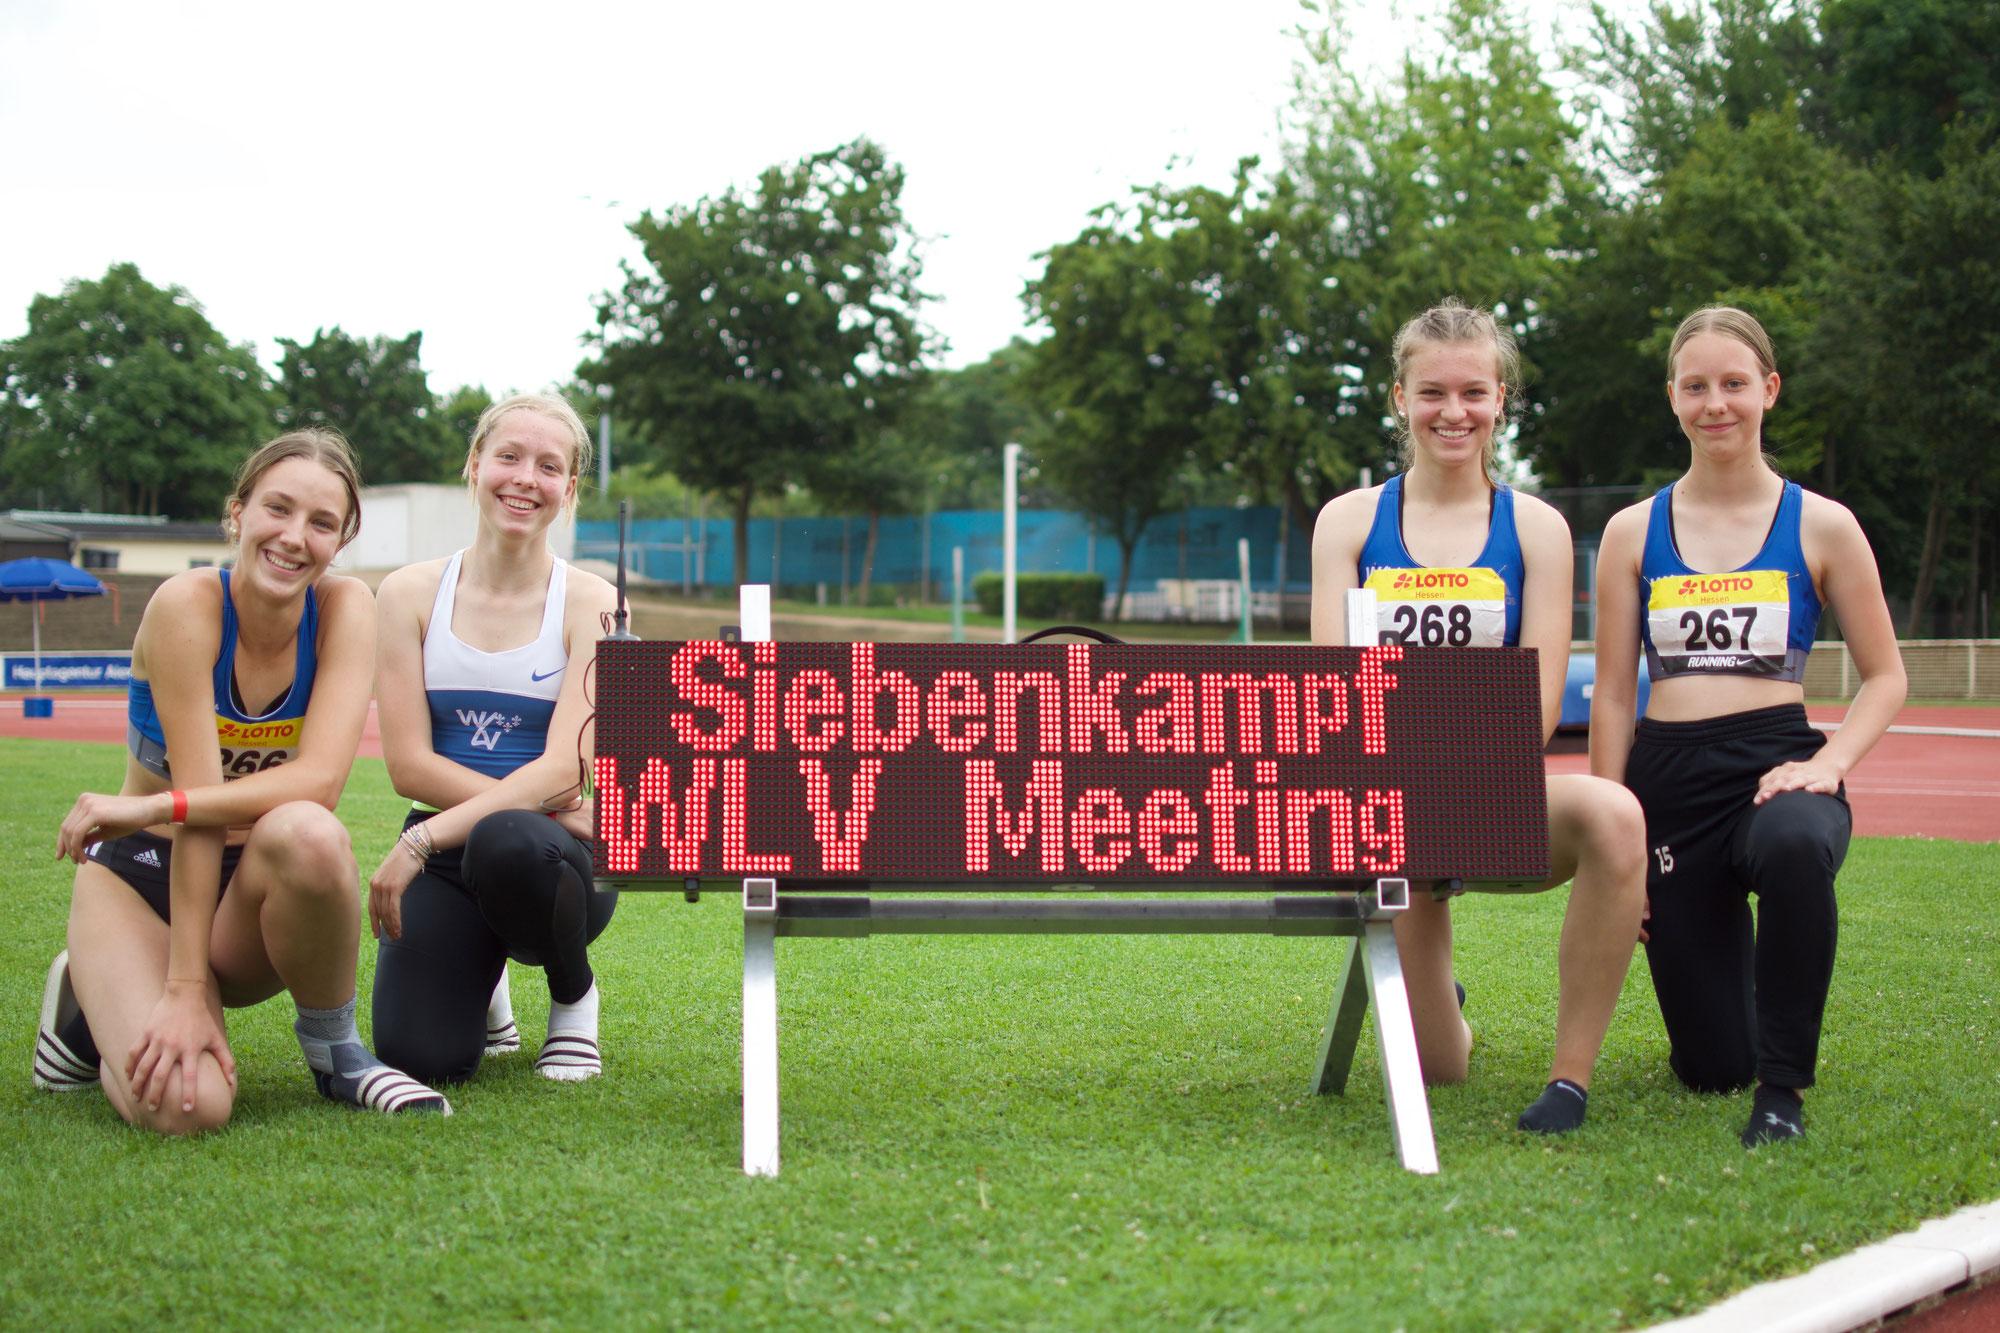 Mehrkampfmeeting Wiesbaden